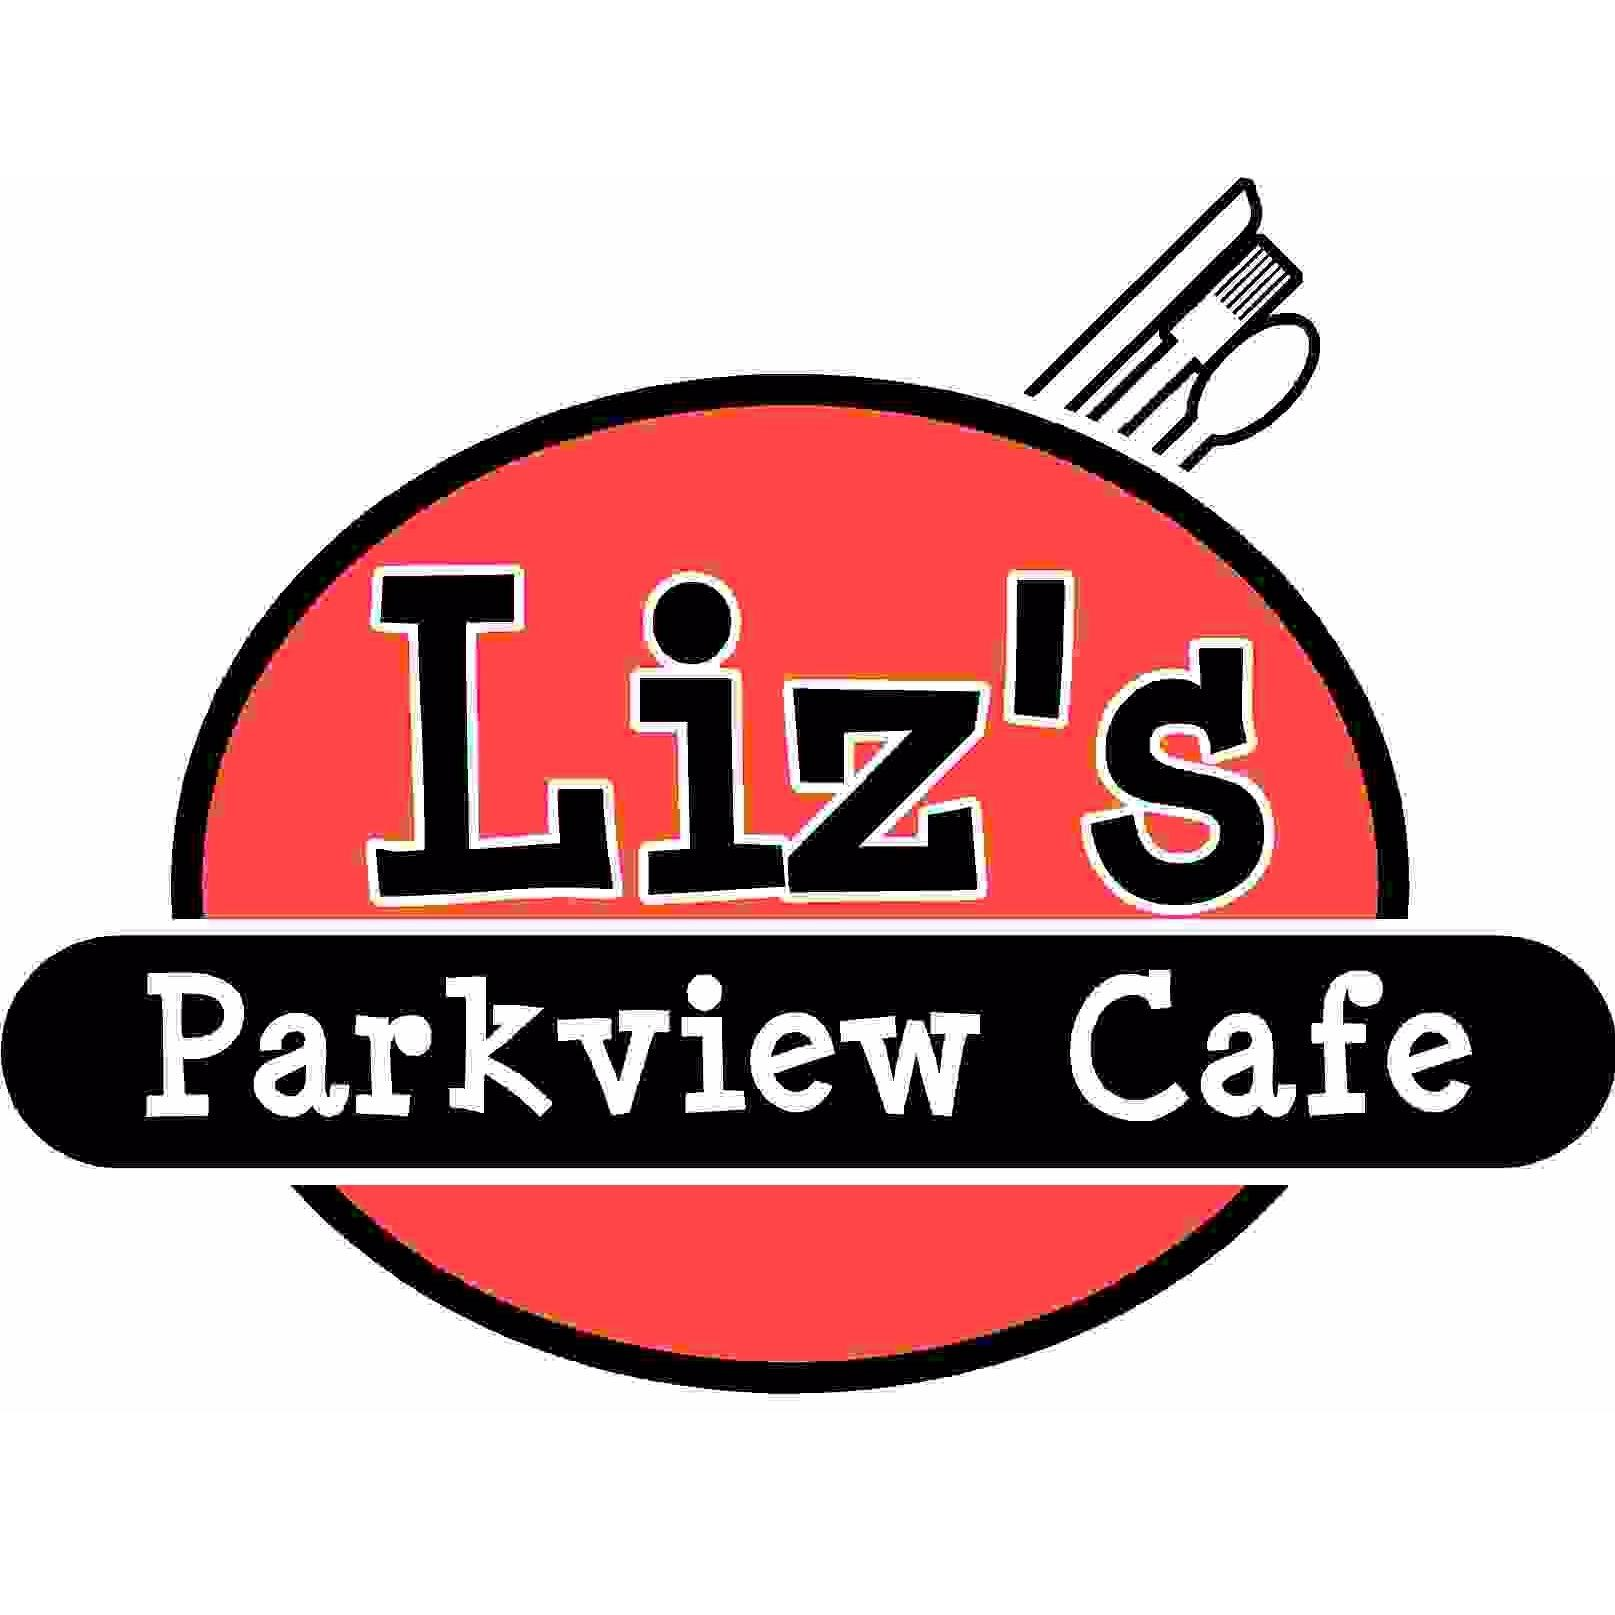 Liz's Parkview Cafe - Richland, MI - Banquet Facilities